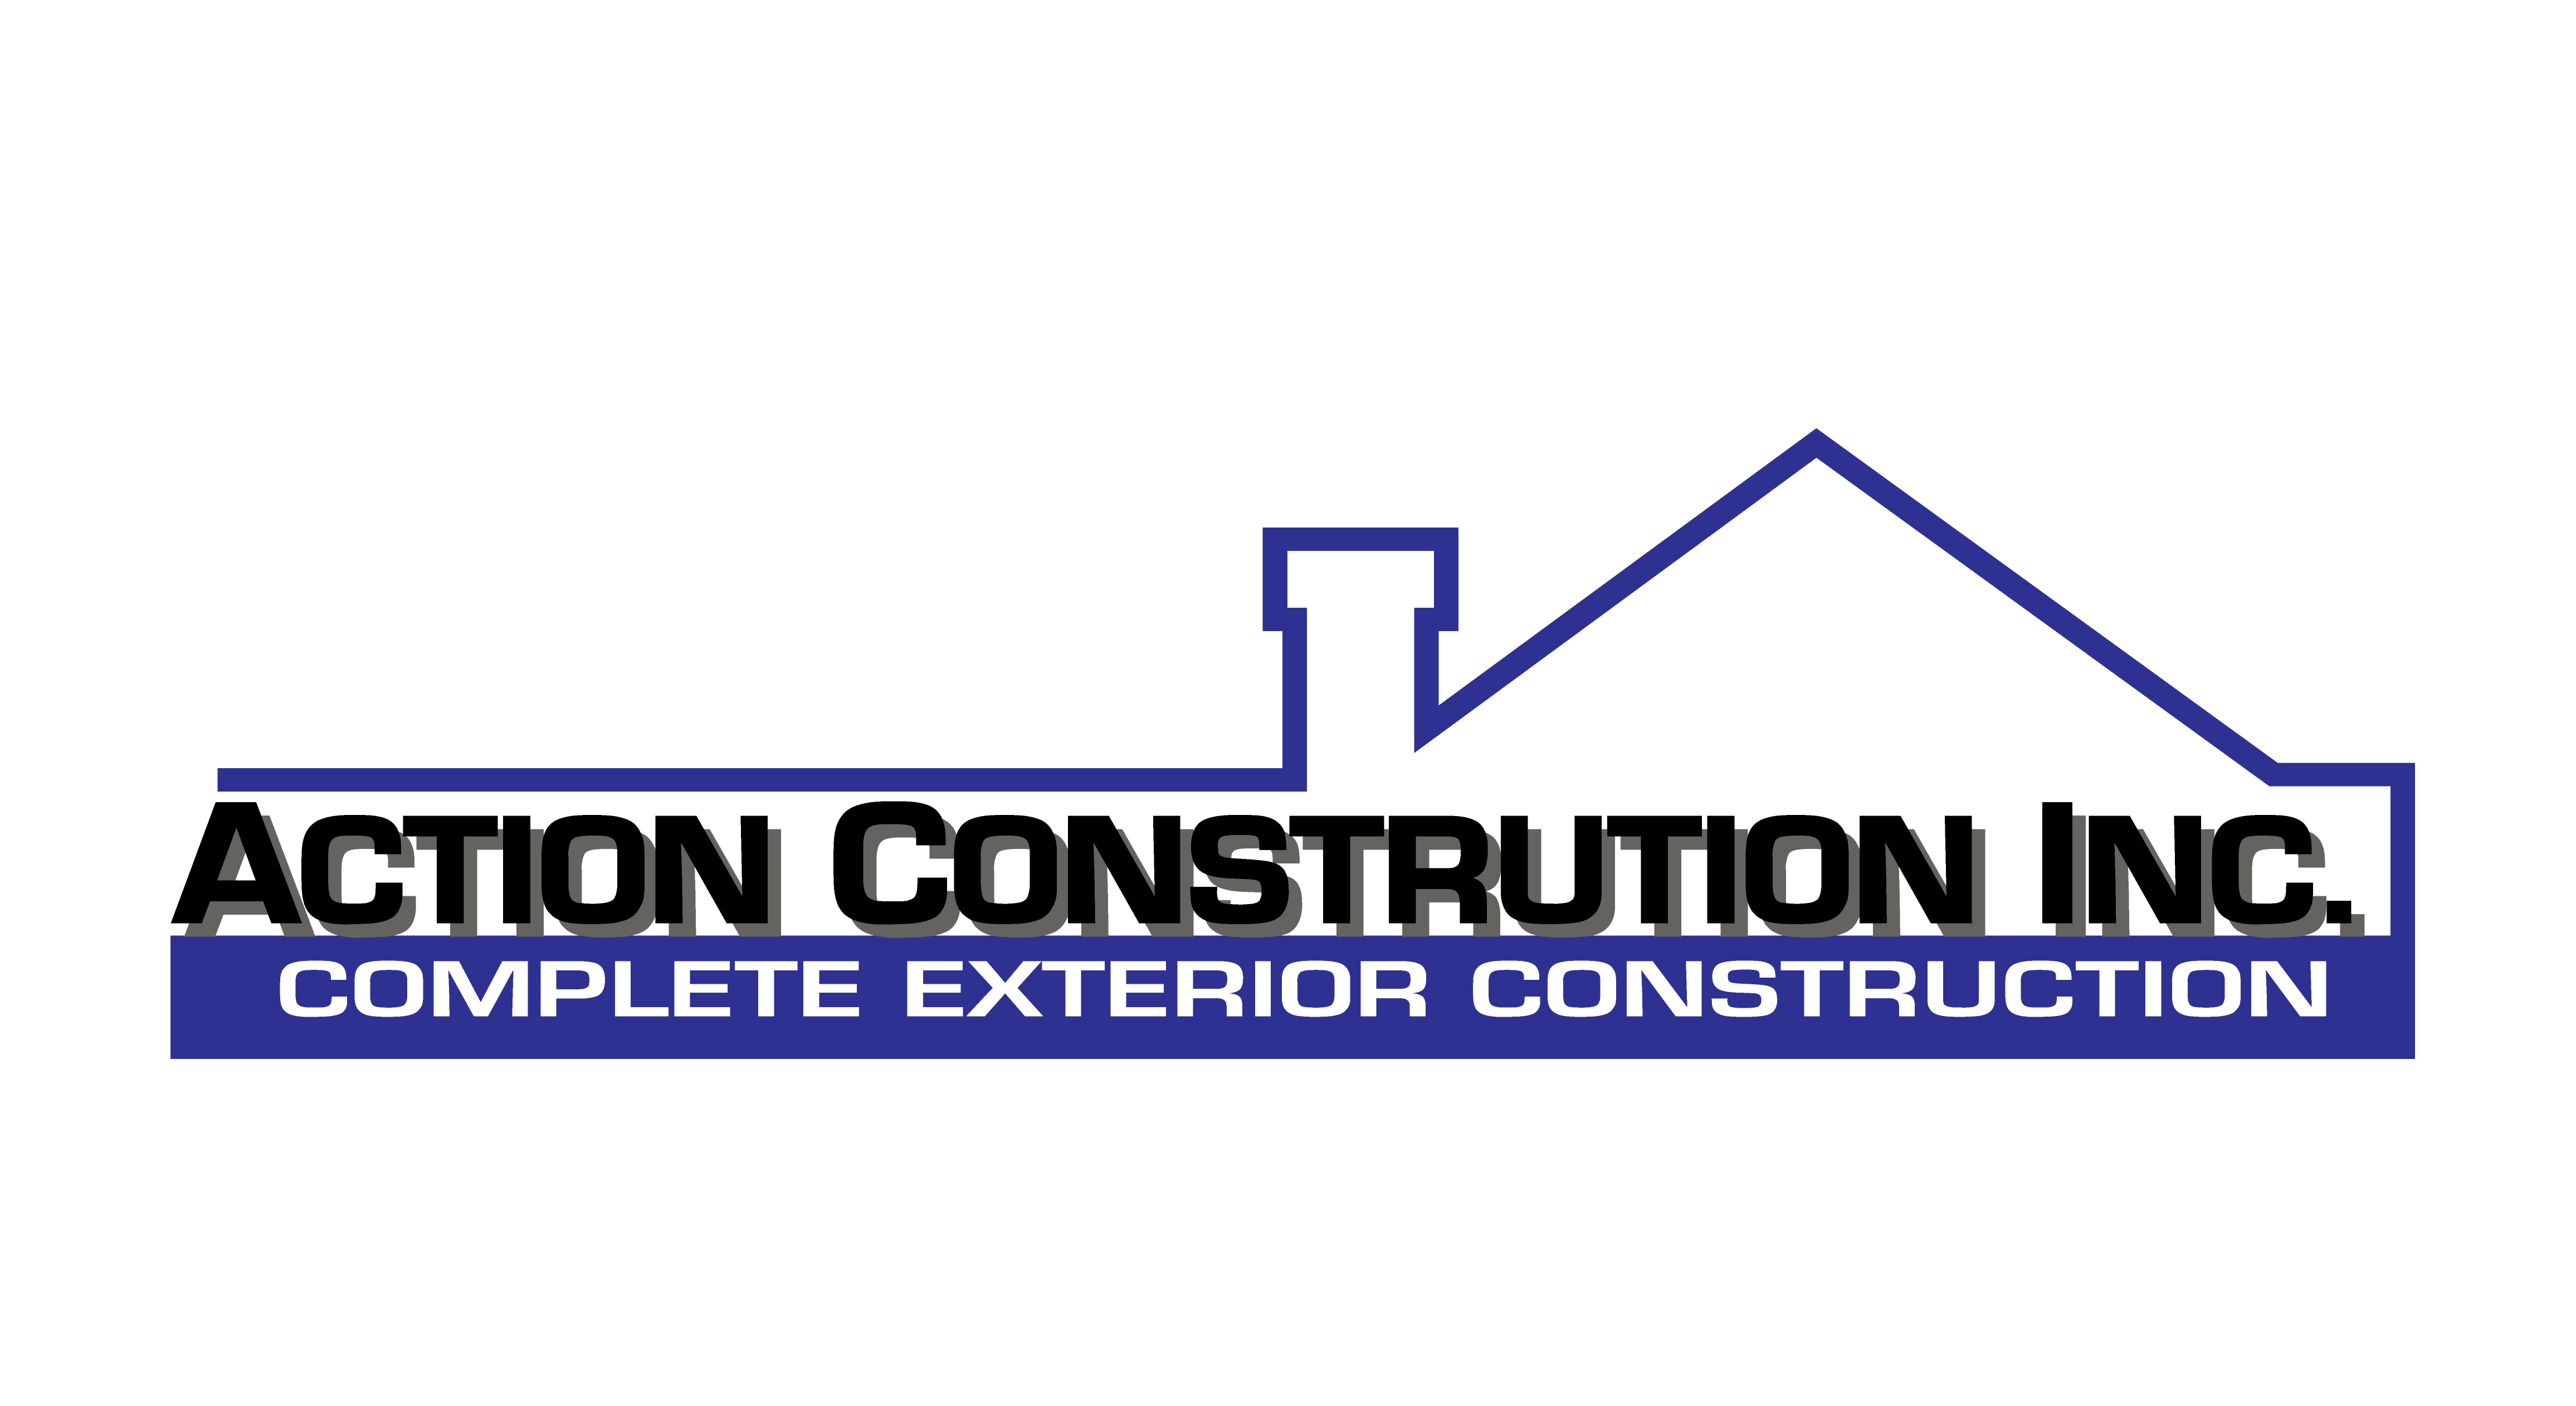 Action Construction Inc.